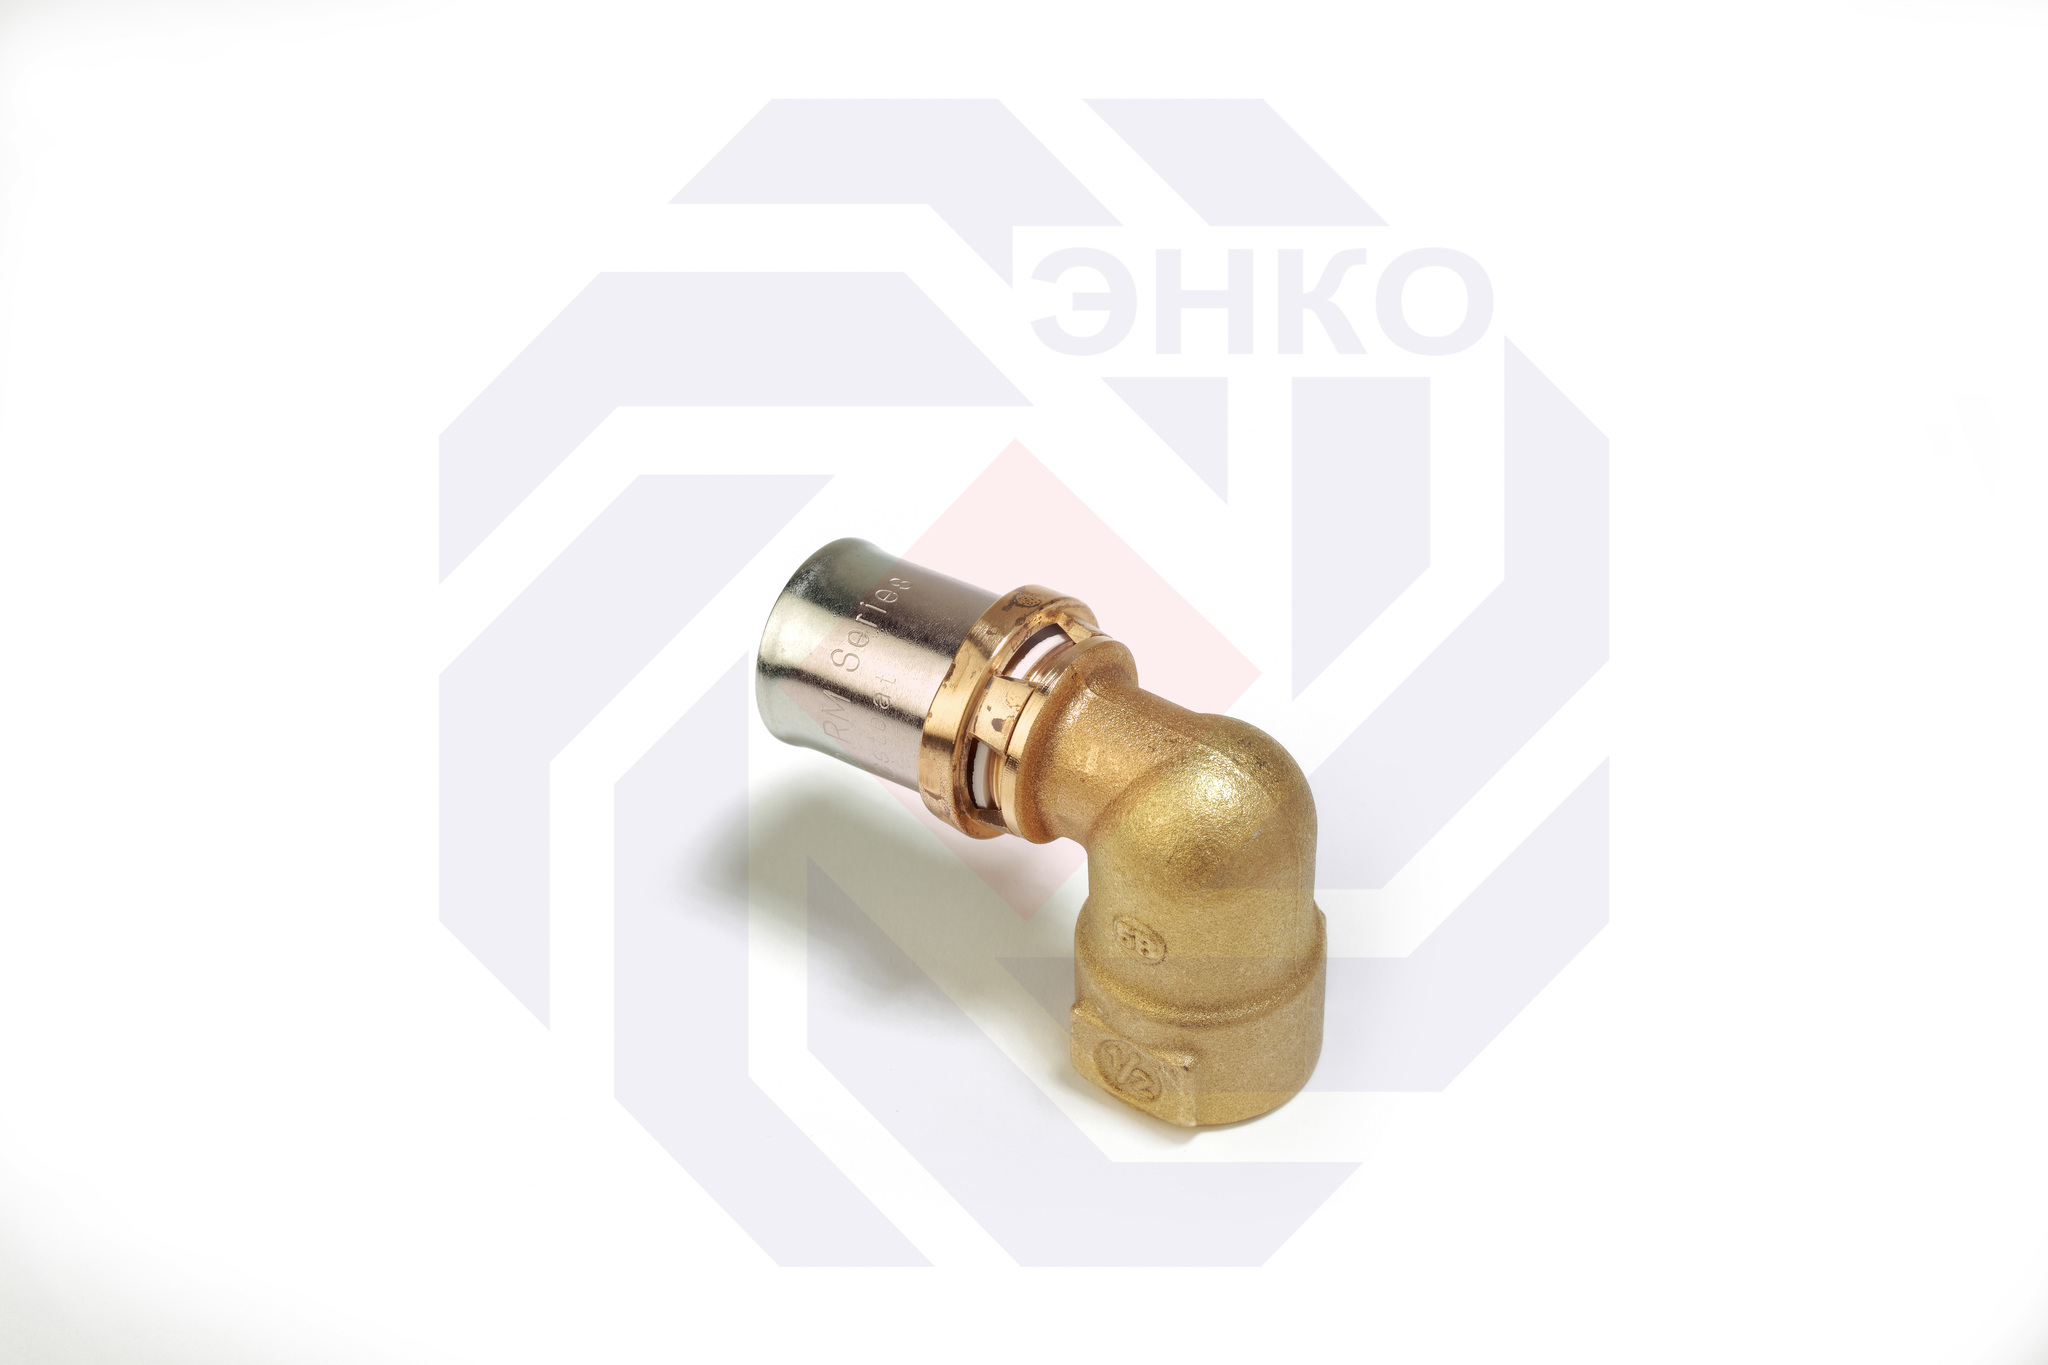 Пресс-фитинг отвод 90° ВР GIACOMINI RM 20⨯¾